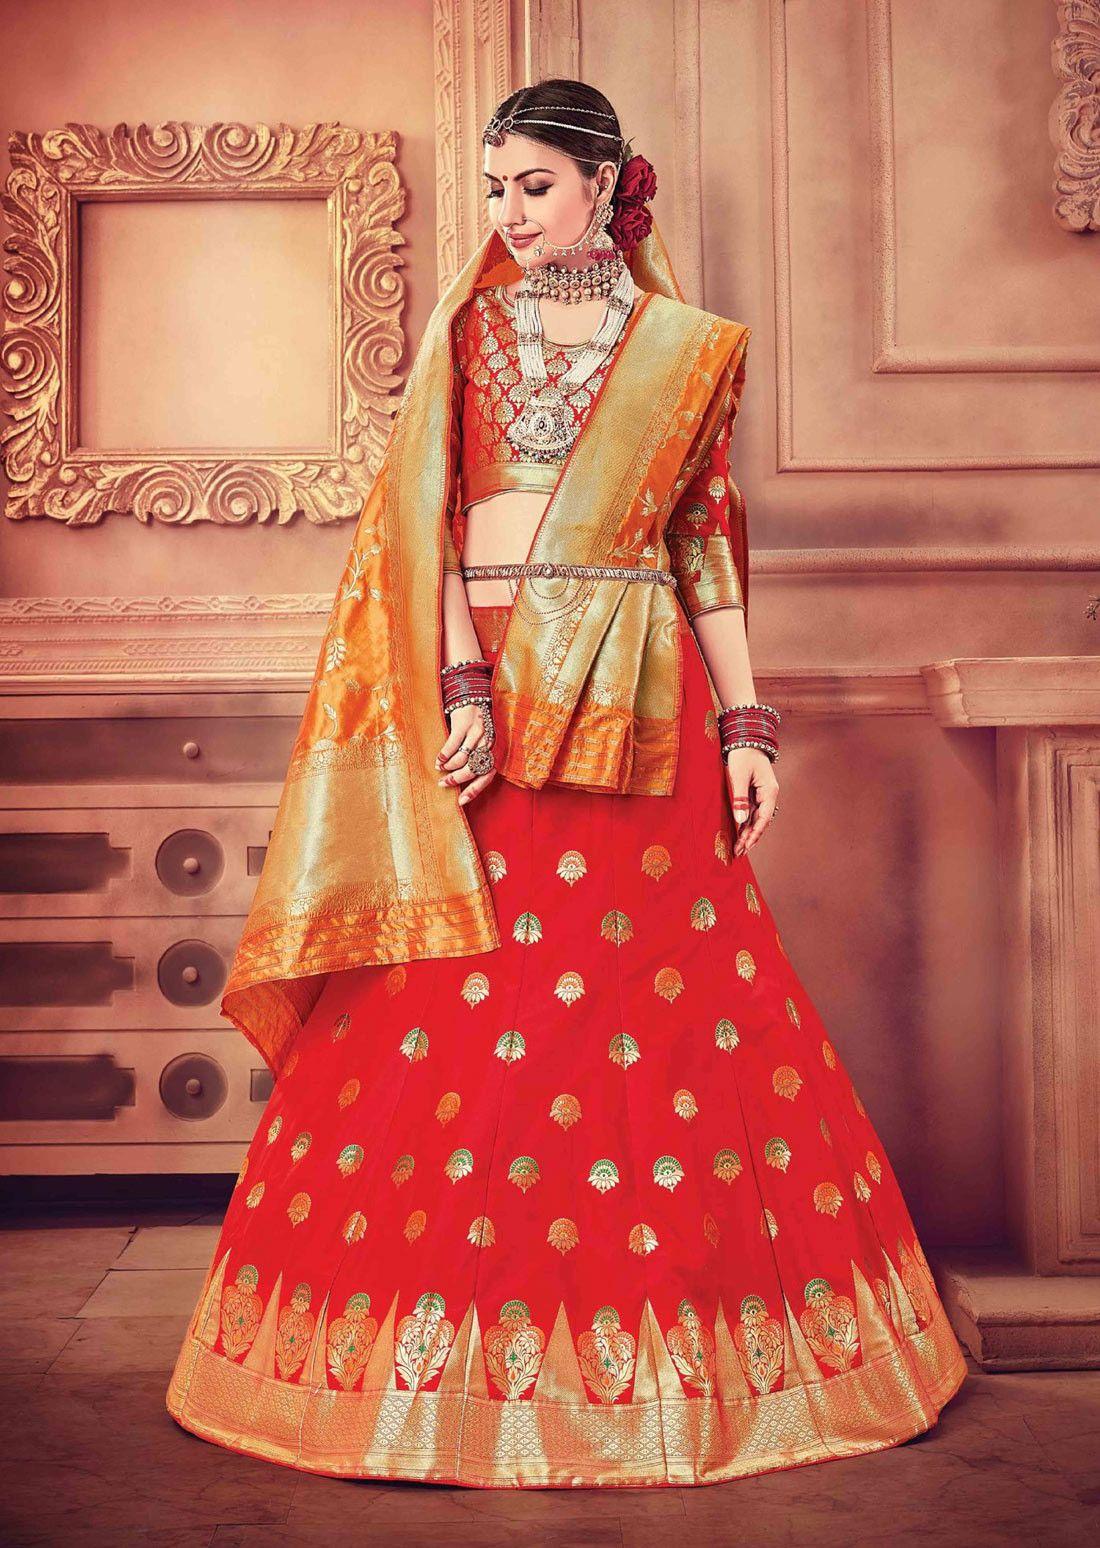 fa7f77e102 Hot Red bridal lehenga choli in pure banarasi silk | Bridal Wear ...